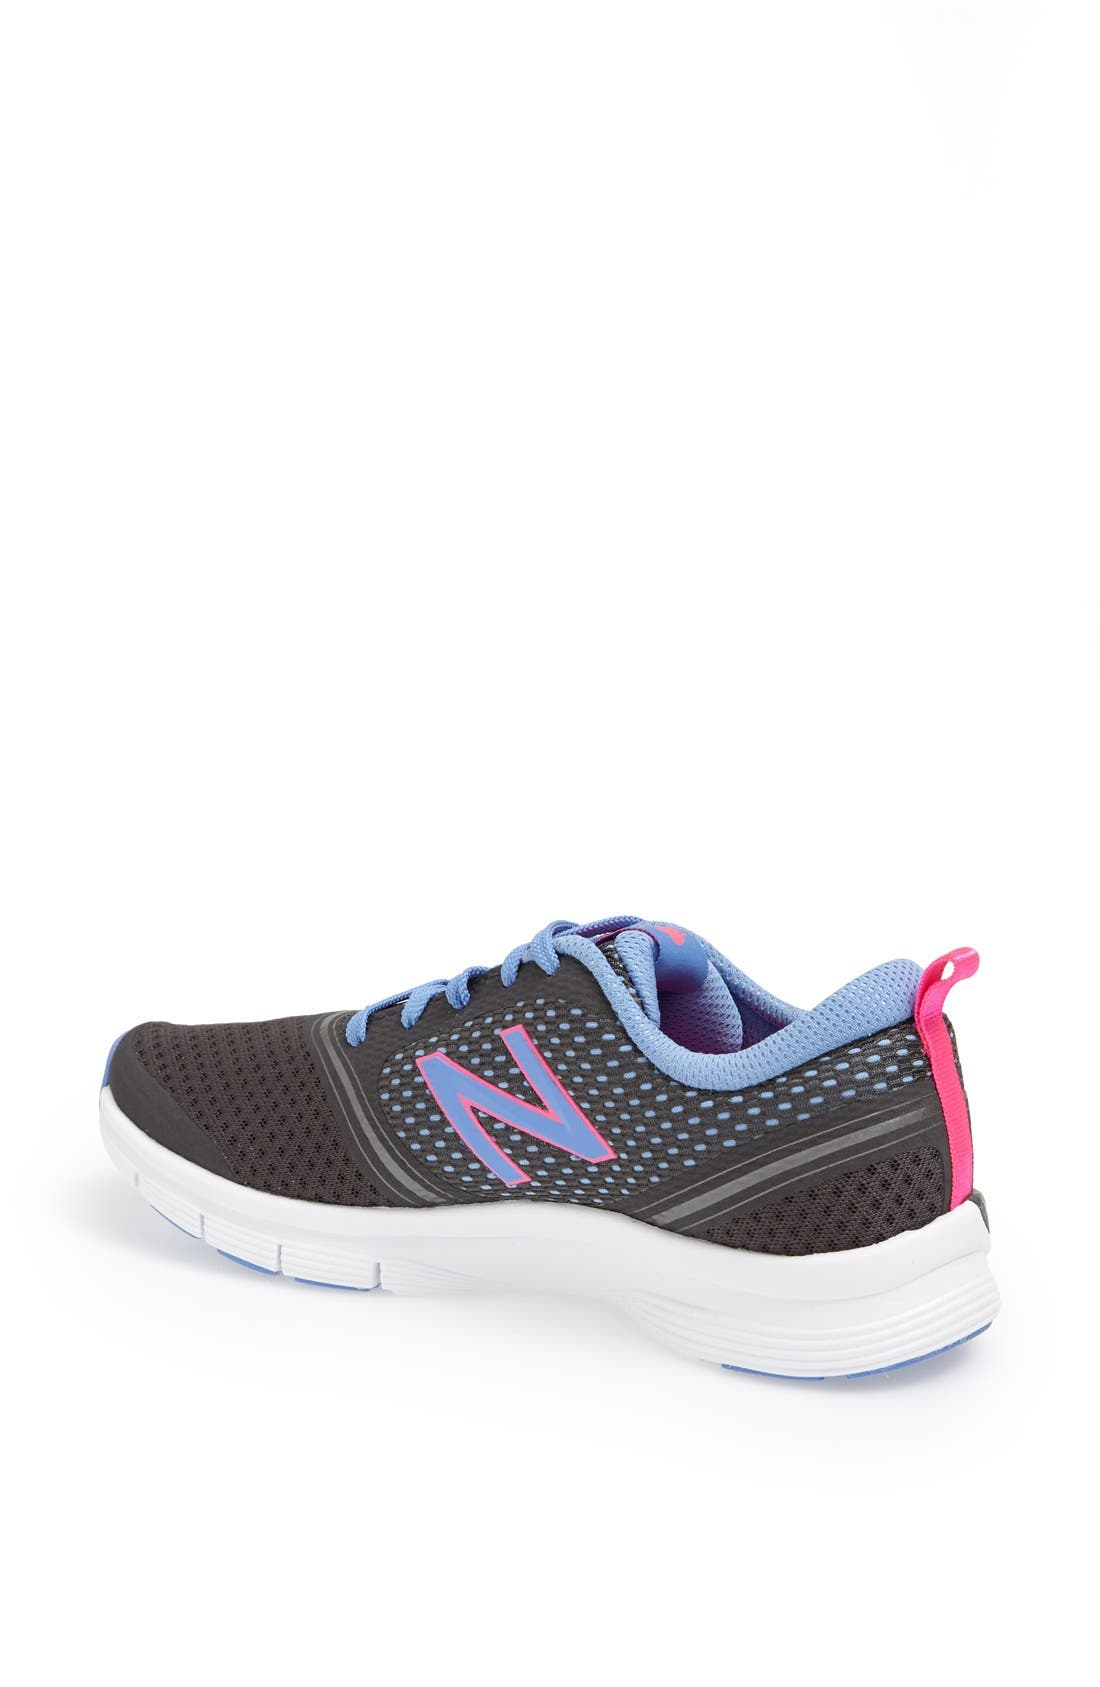 Alternate Image 2  - New Balance 'WX711' Running Shoe (Women)